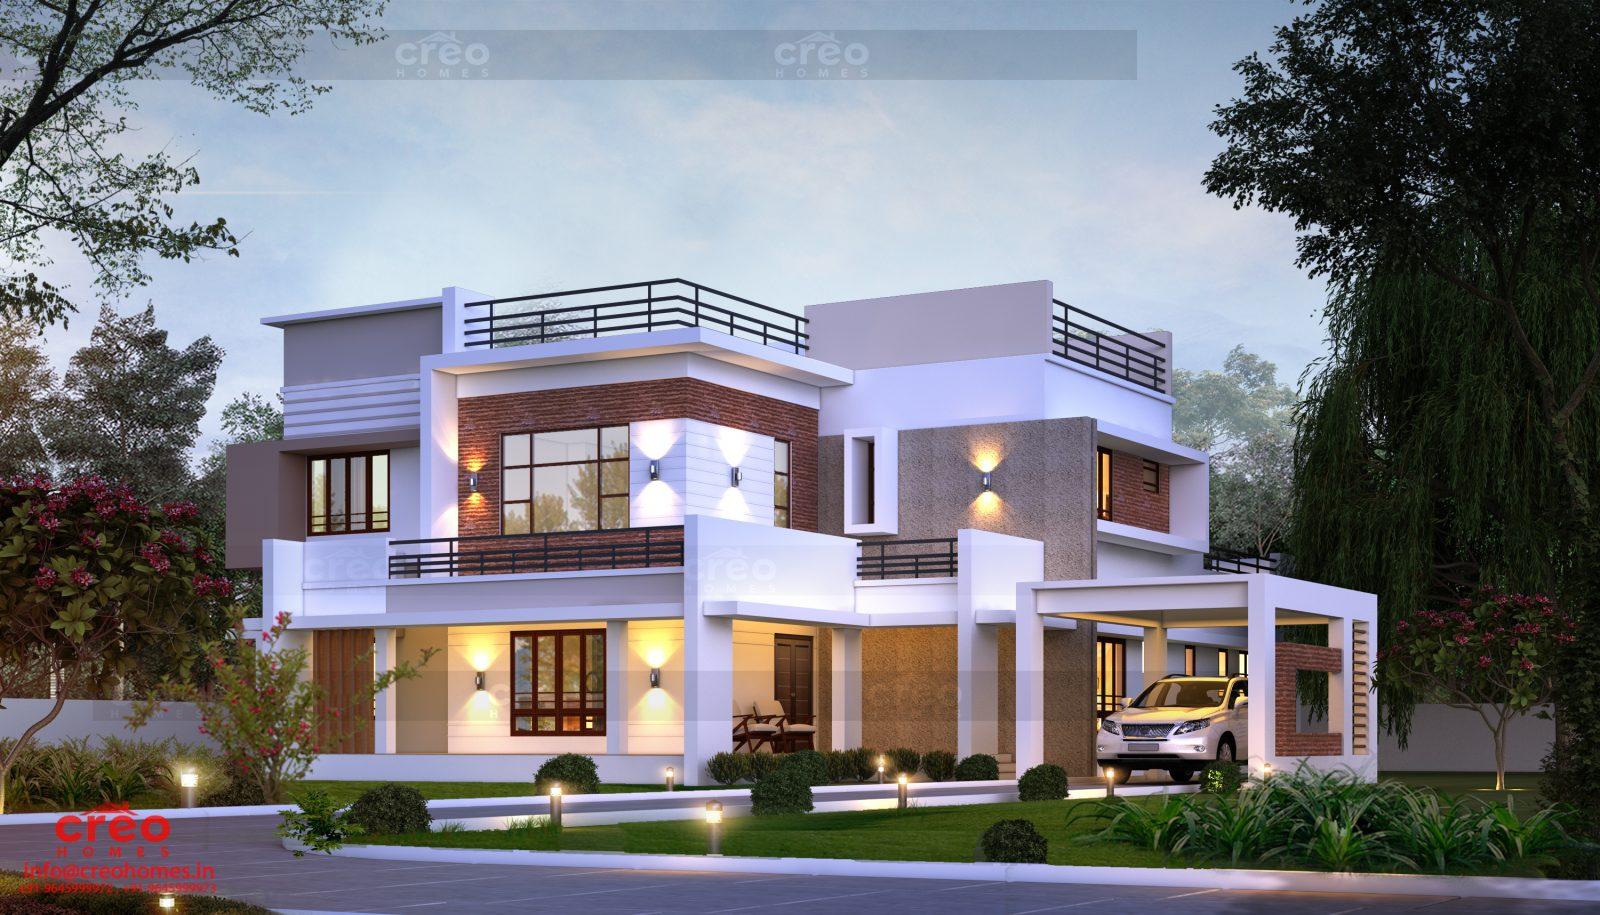 4203 Square Feet Double Floor Home Design